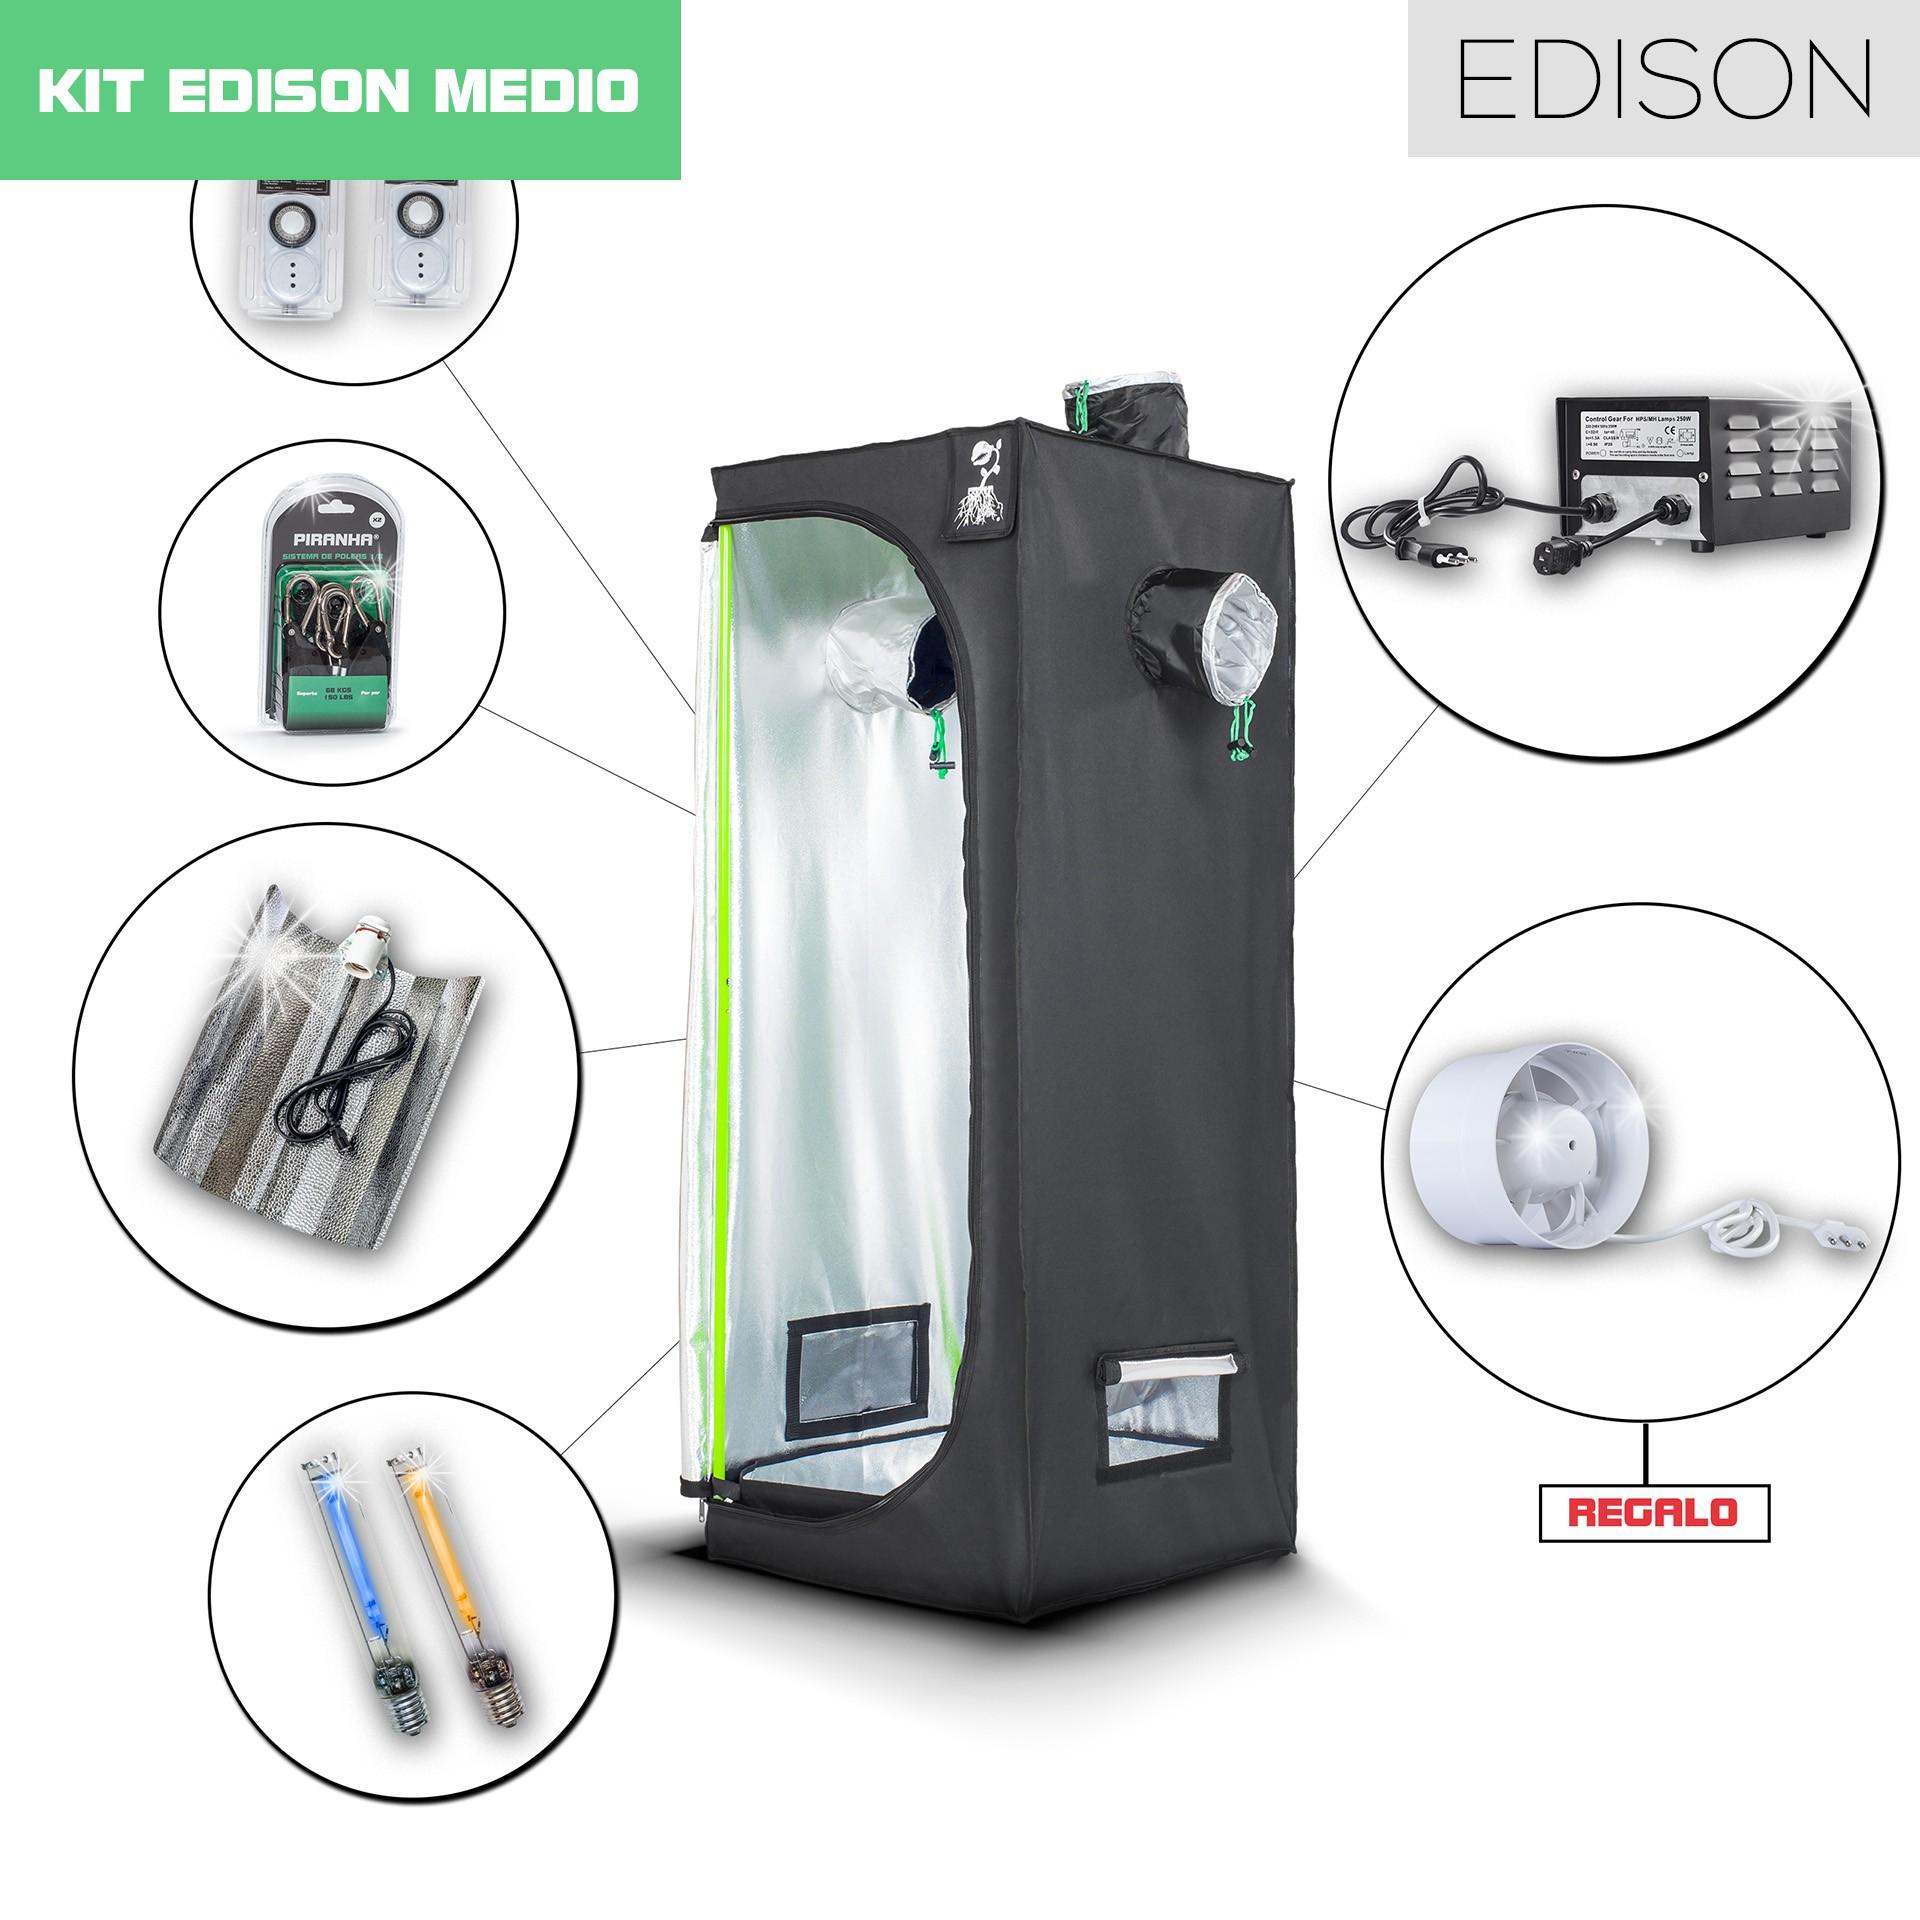 Kit Edison Pro 60 - 250W Medio